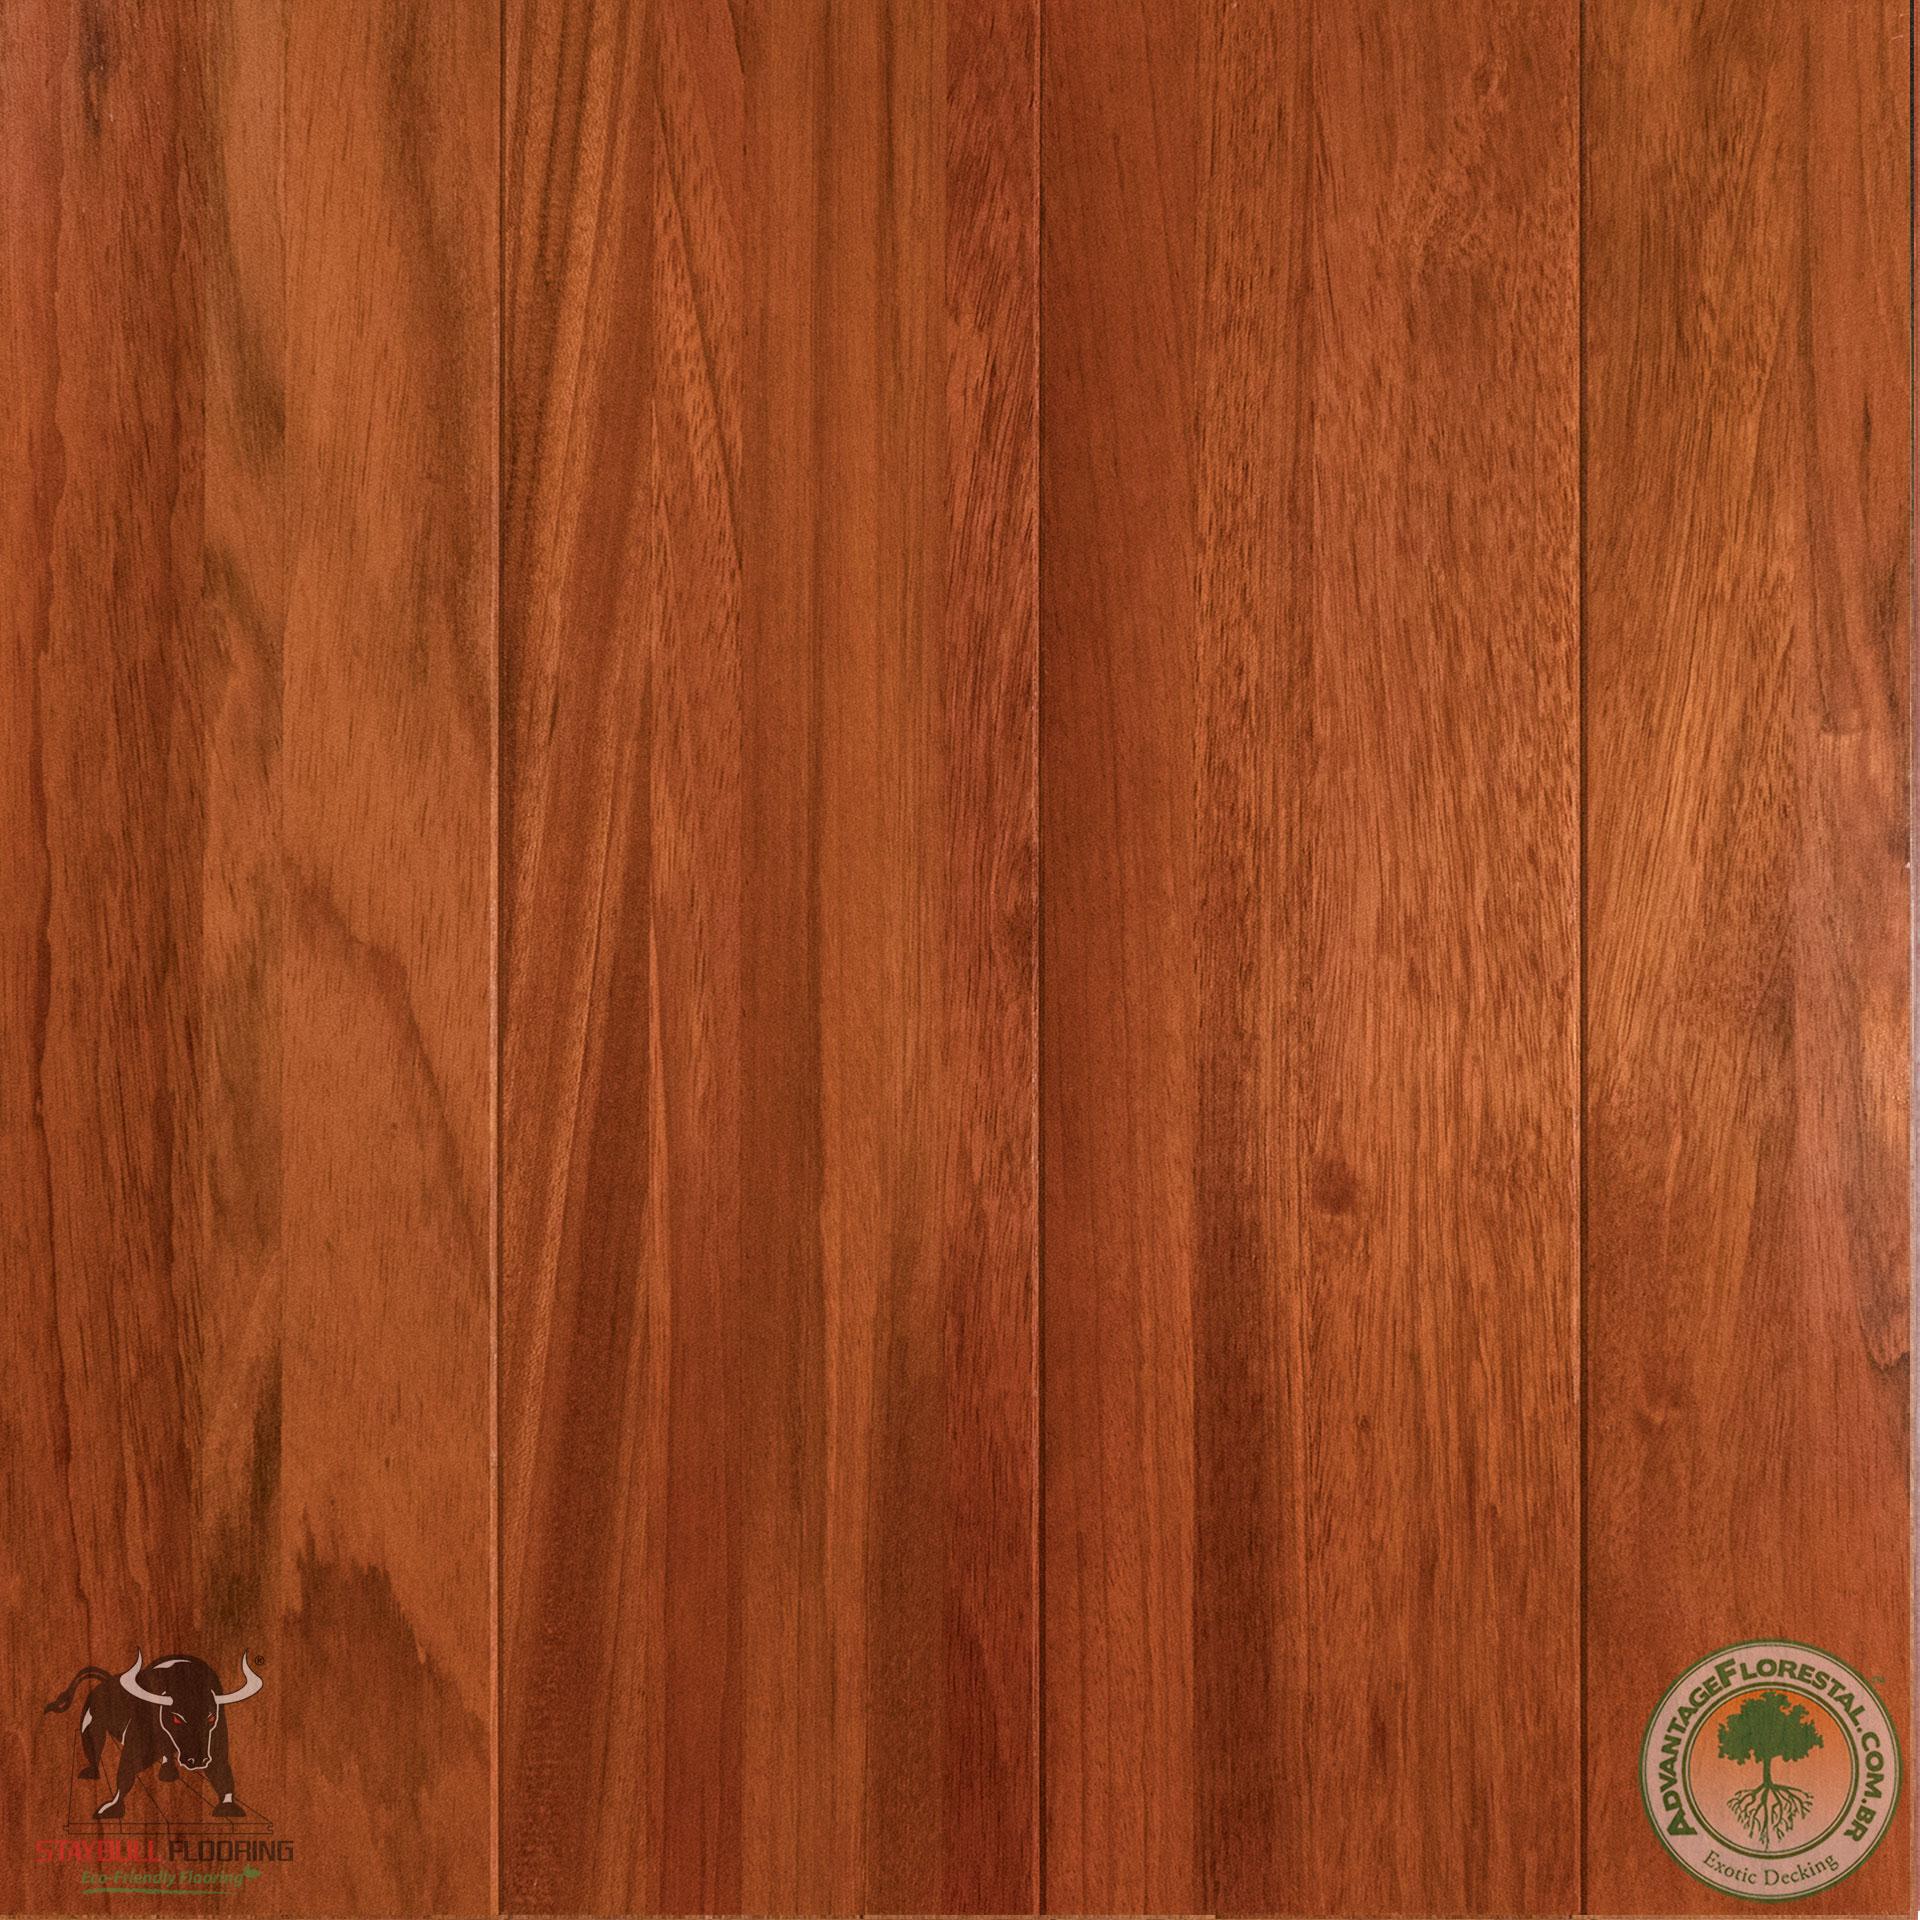 Fsc certified wholesale hardwood flooring available for Wholesale hardwood flooring